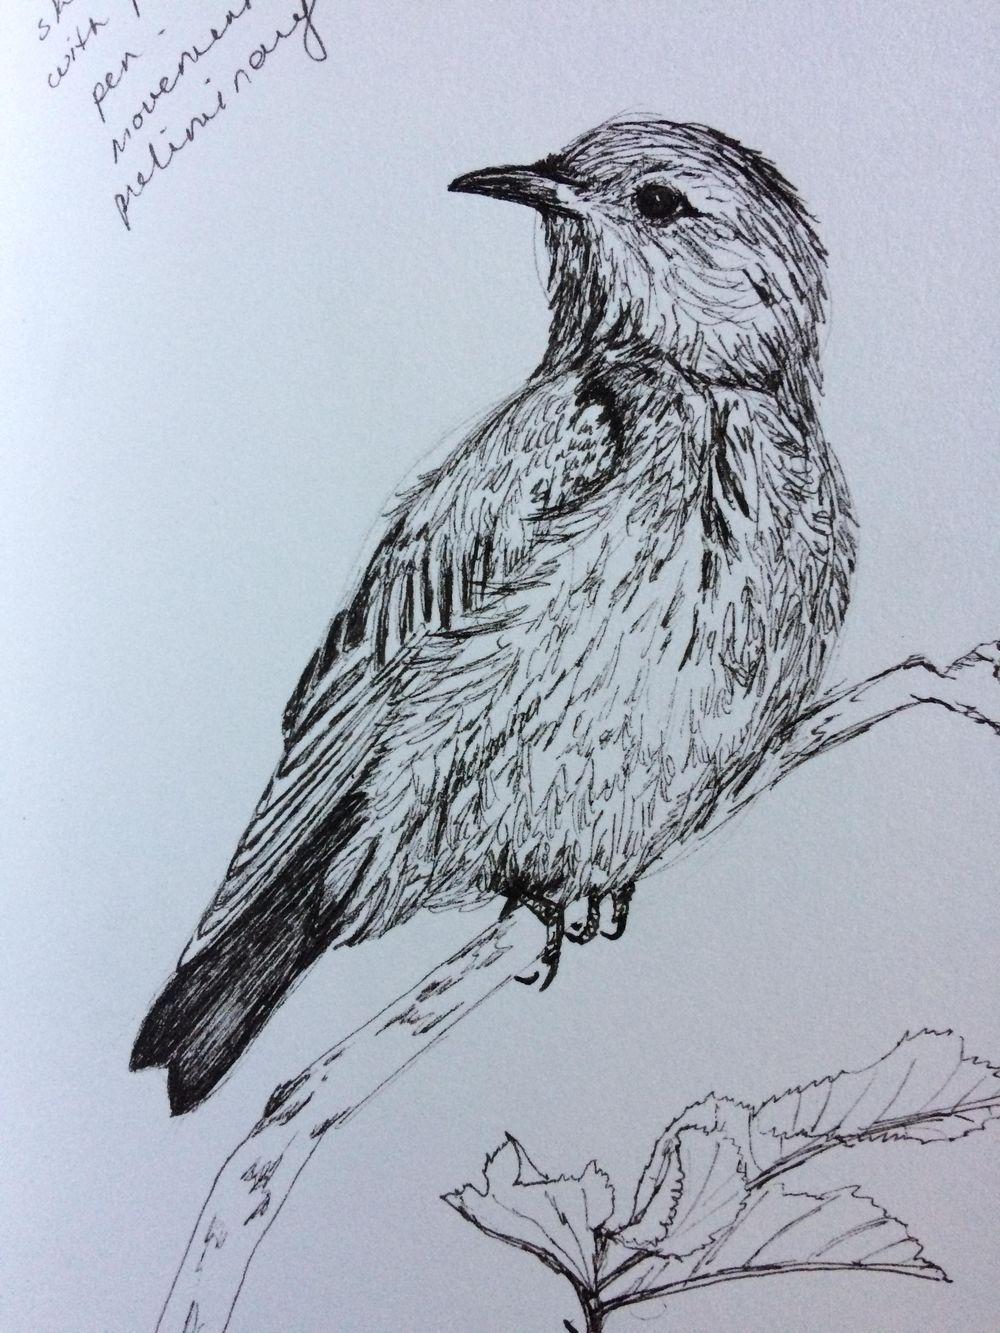 Bluebird - image 1 - student project